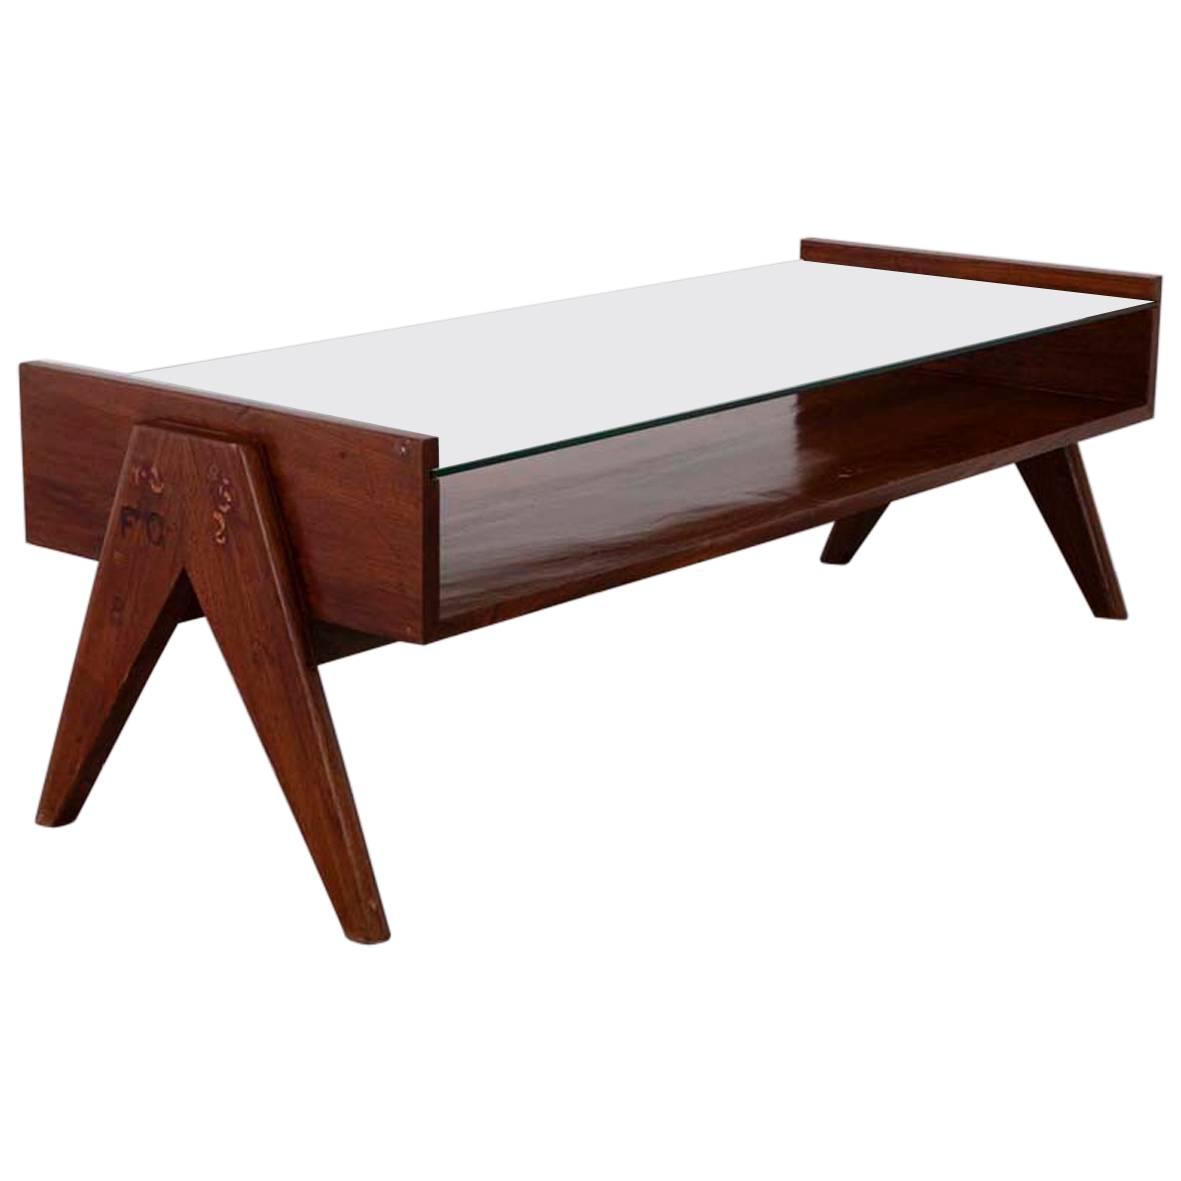 100 Gateleg Coffee Table Antique Flemish Oak Drop  : 3448702z from 45.32.79.15 size 1181 x 1181 jpeg 35kB